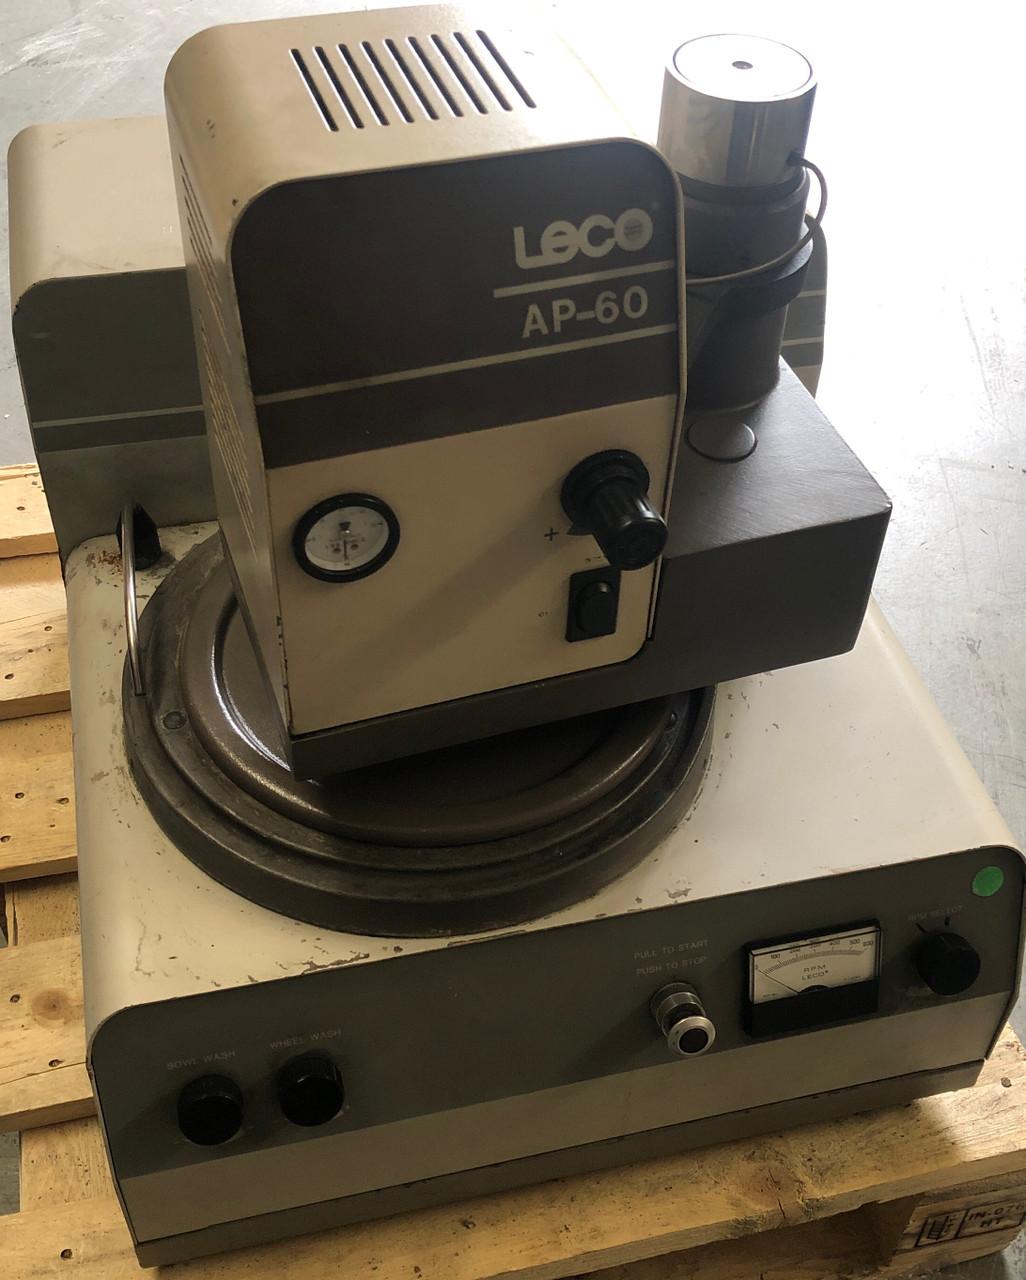 "Leco VP-160 8"" Variable-Speed Polisher Grinder w/AP-60 Auto-Polishing Unit"